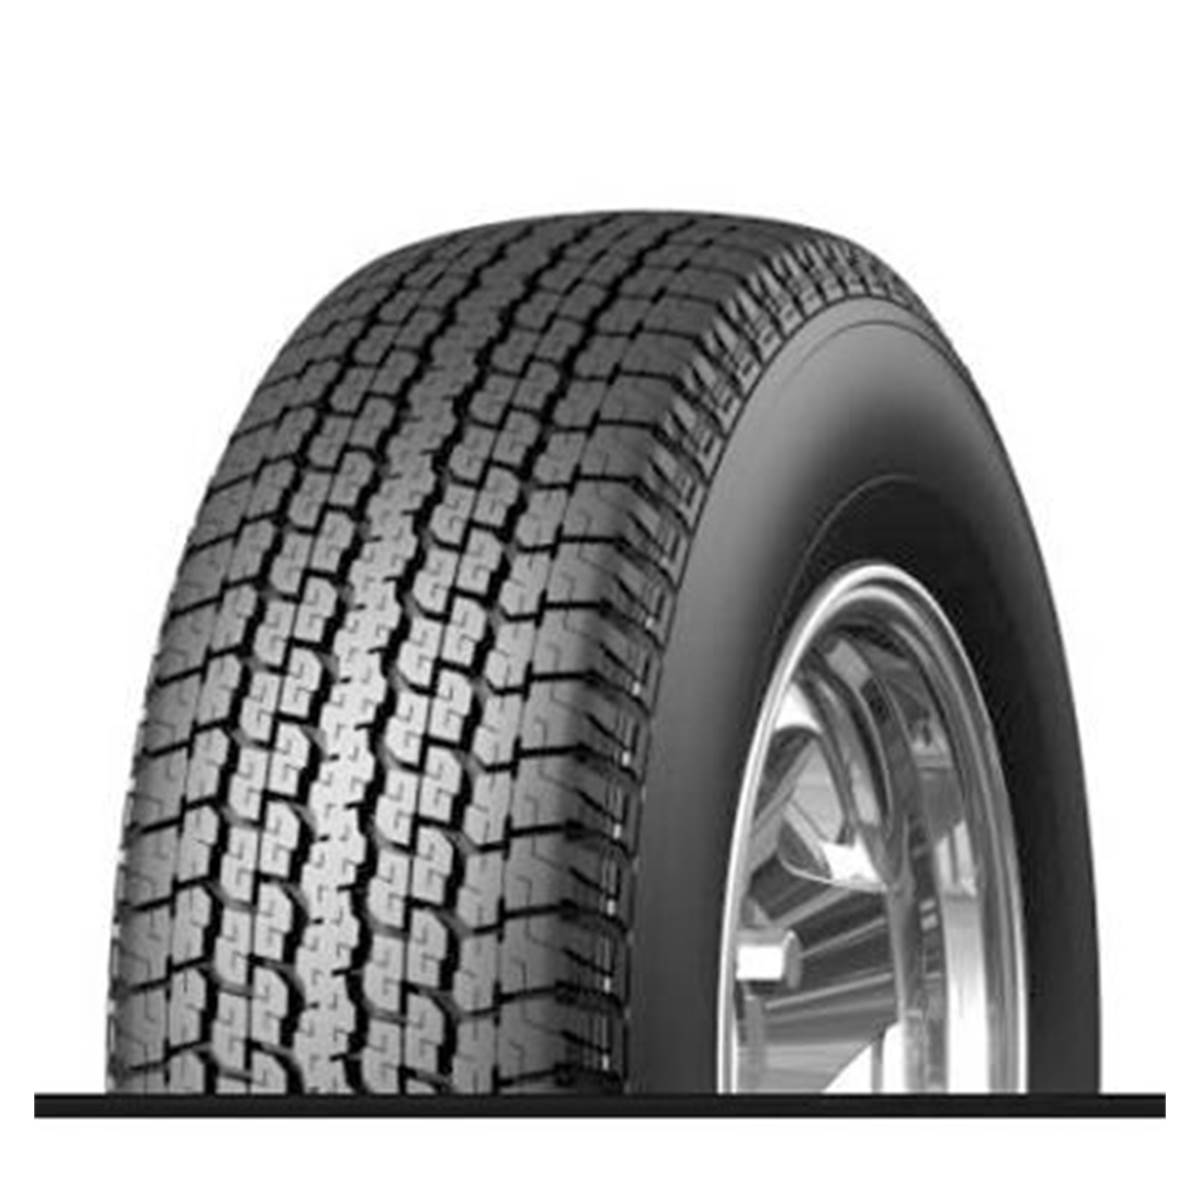 Pneu Bridgestone 265/65X17 112 H DUELER D840